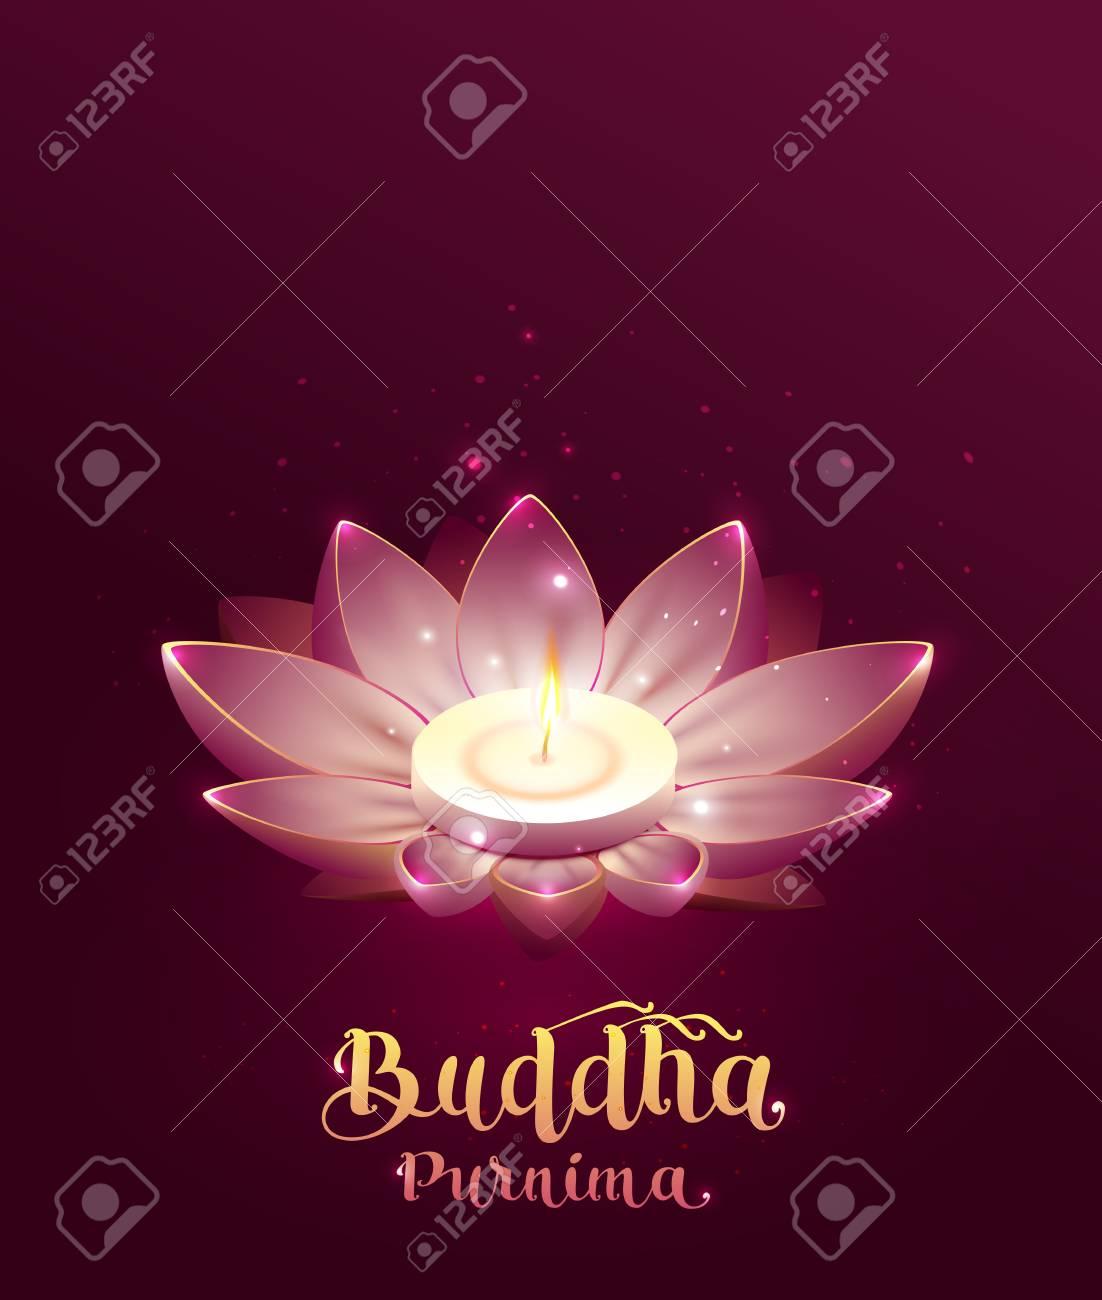 Buddha Purnima Vesak Day Lettering Text Greeting Card Lotus